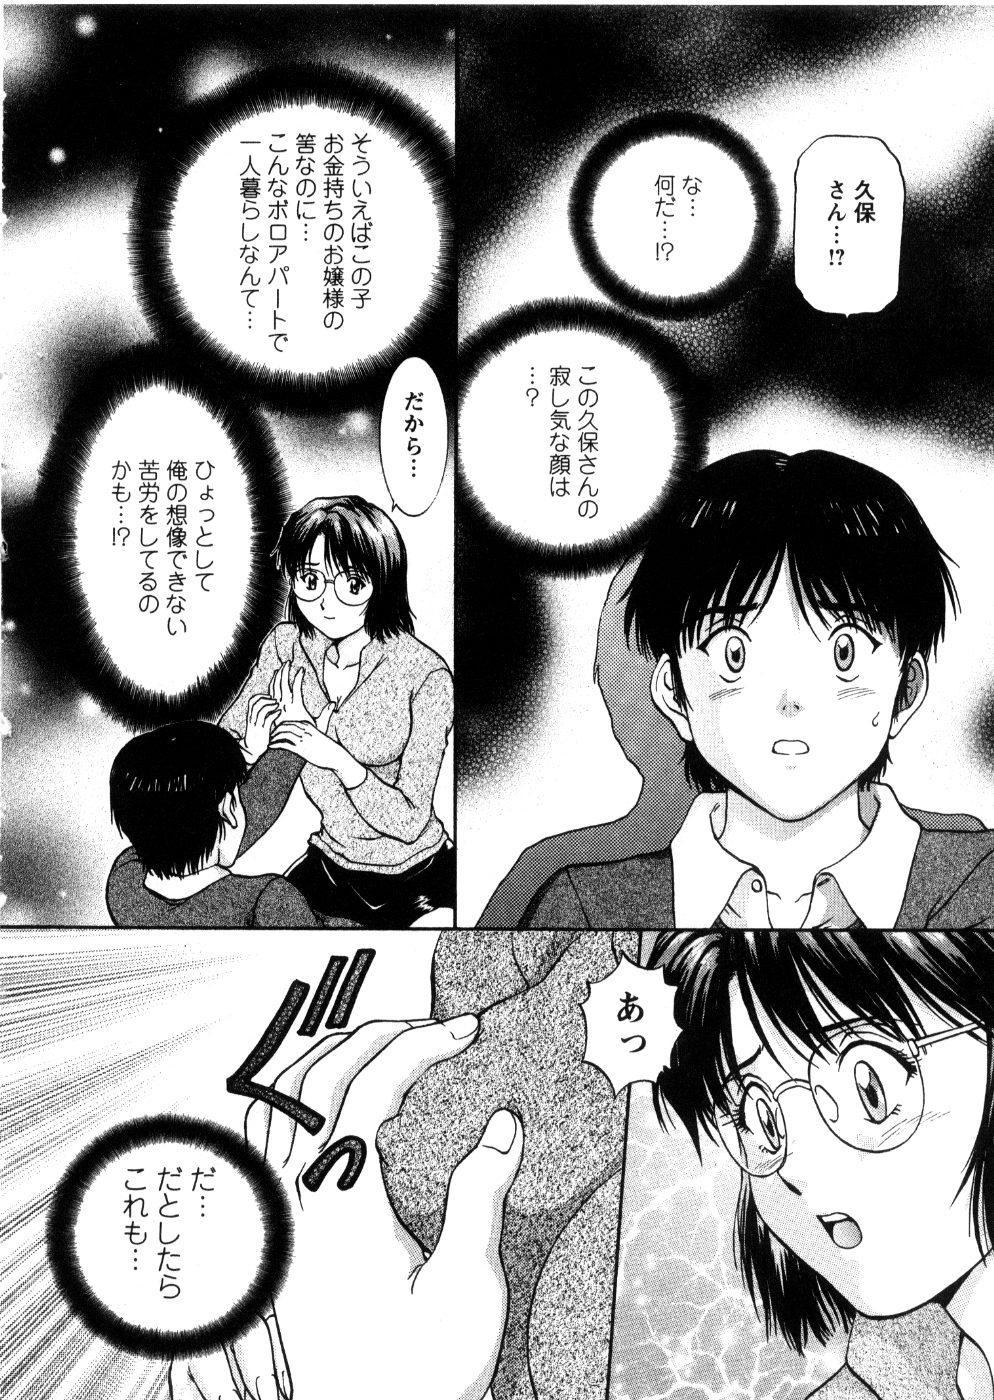 Oneechan-tachi ga Yatte Kuru 03 119